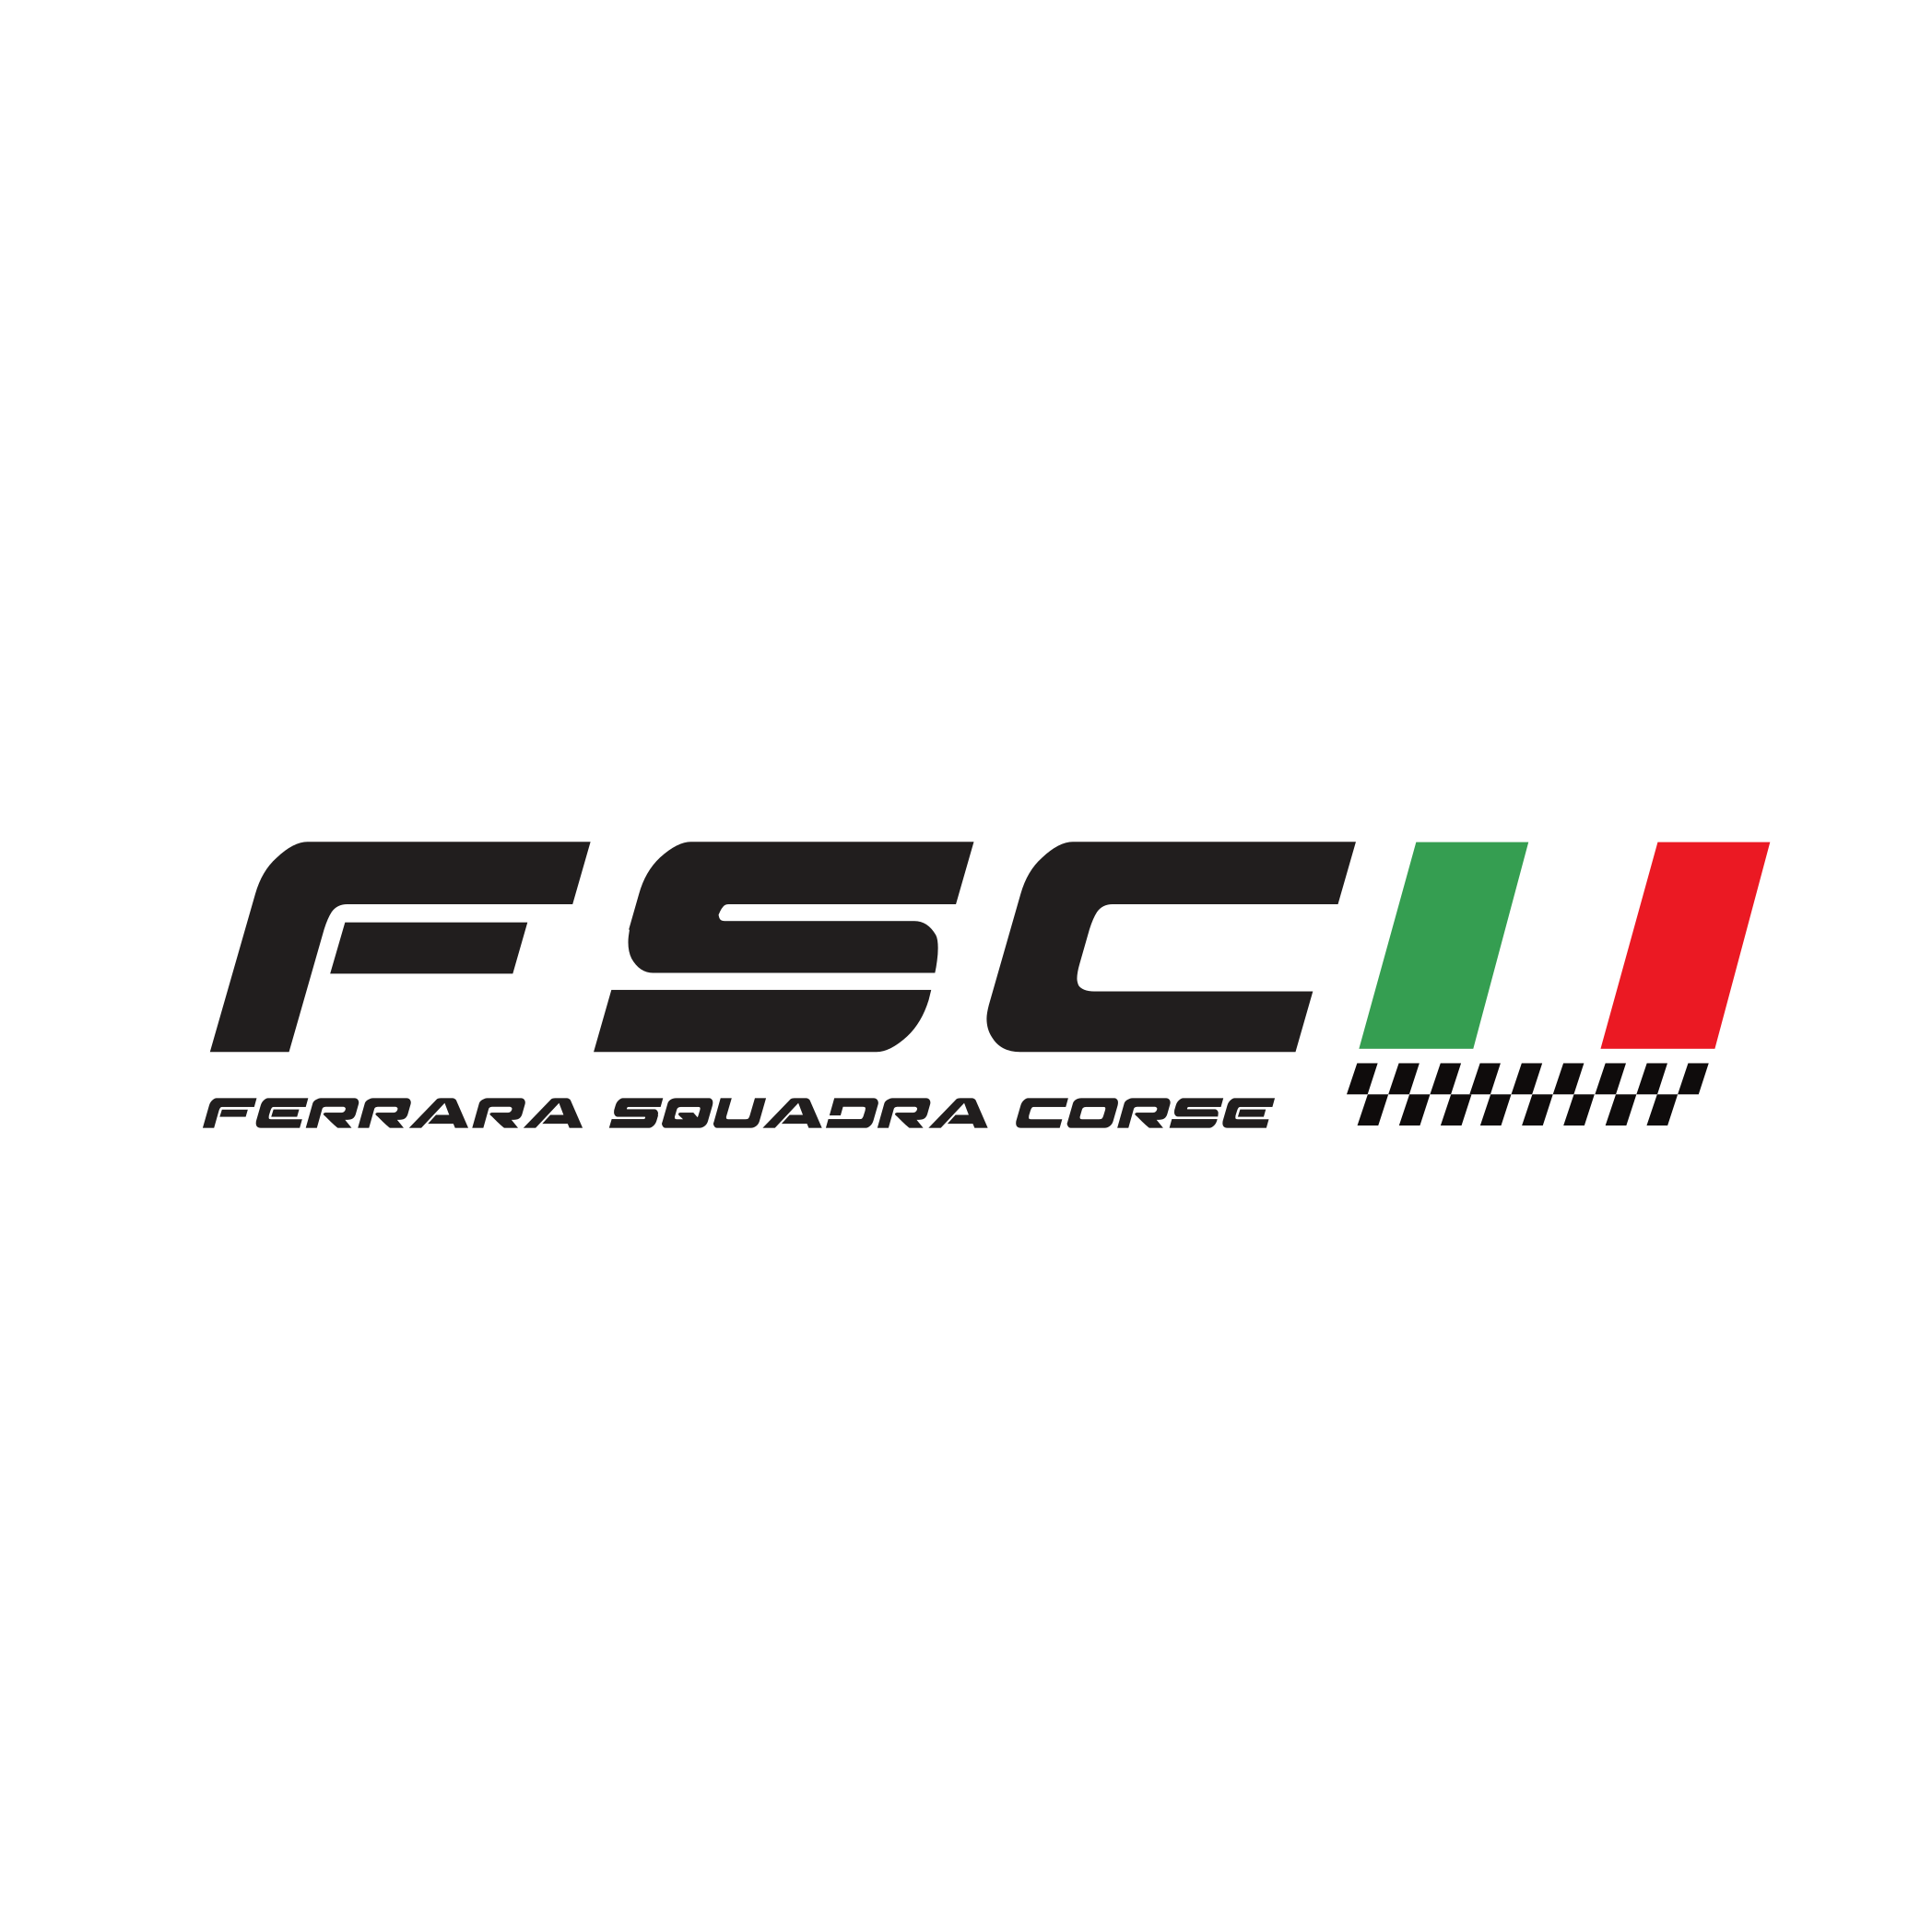 Università di Ferrara – Ferrara Squadra Corse